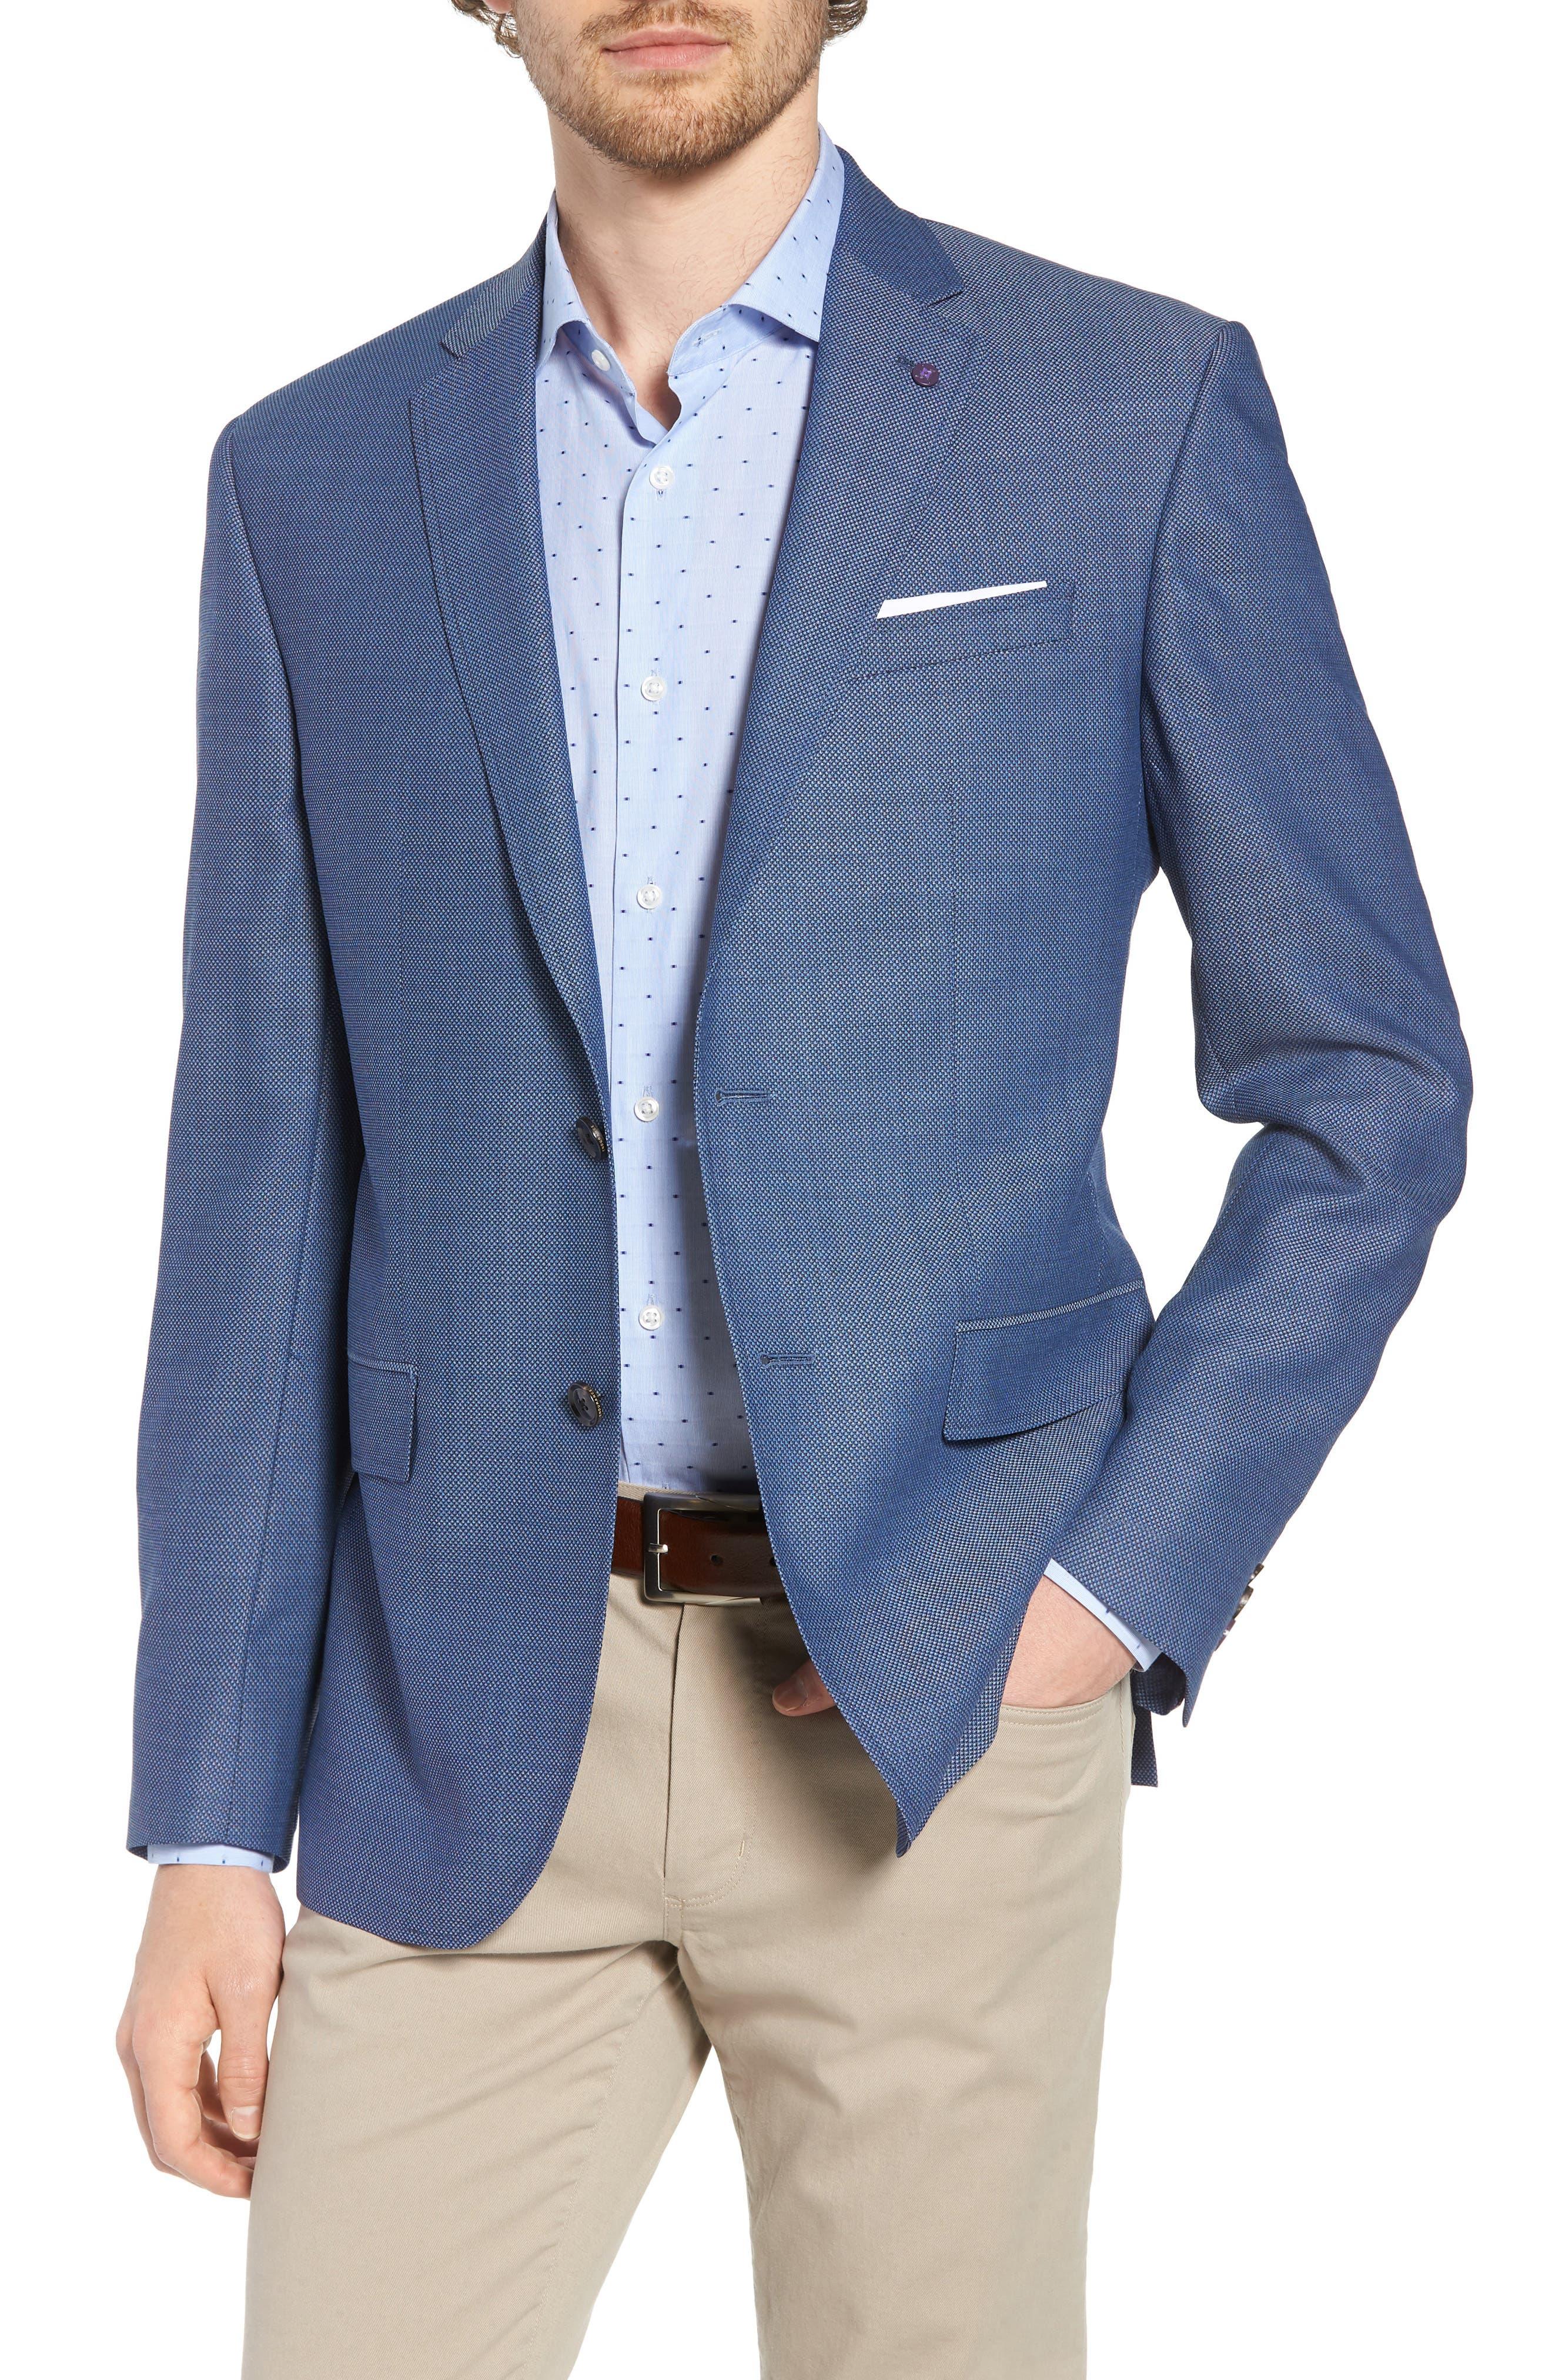 Jay Trim Fit Wool Blazer,                         Main,                         color, Blue